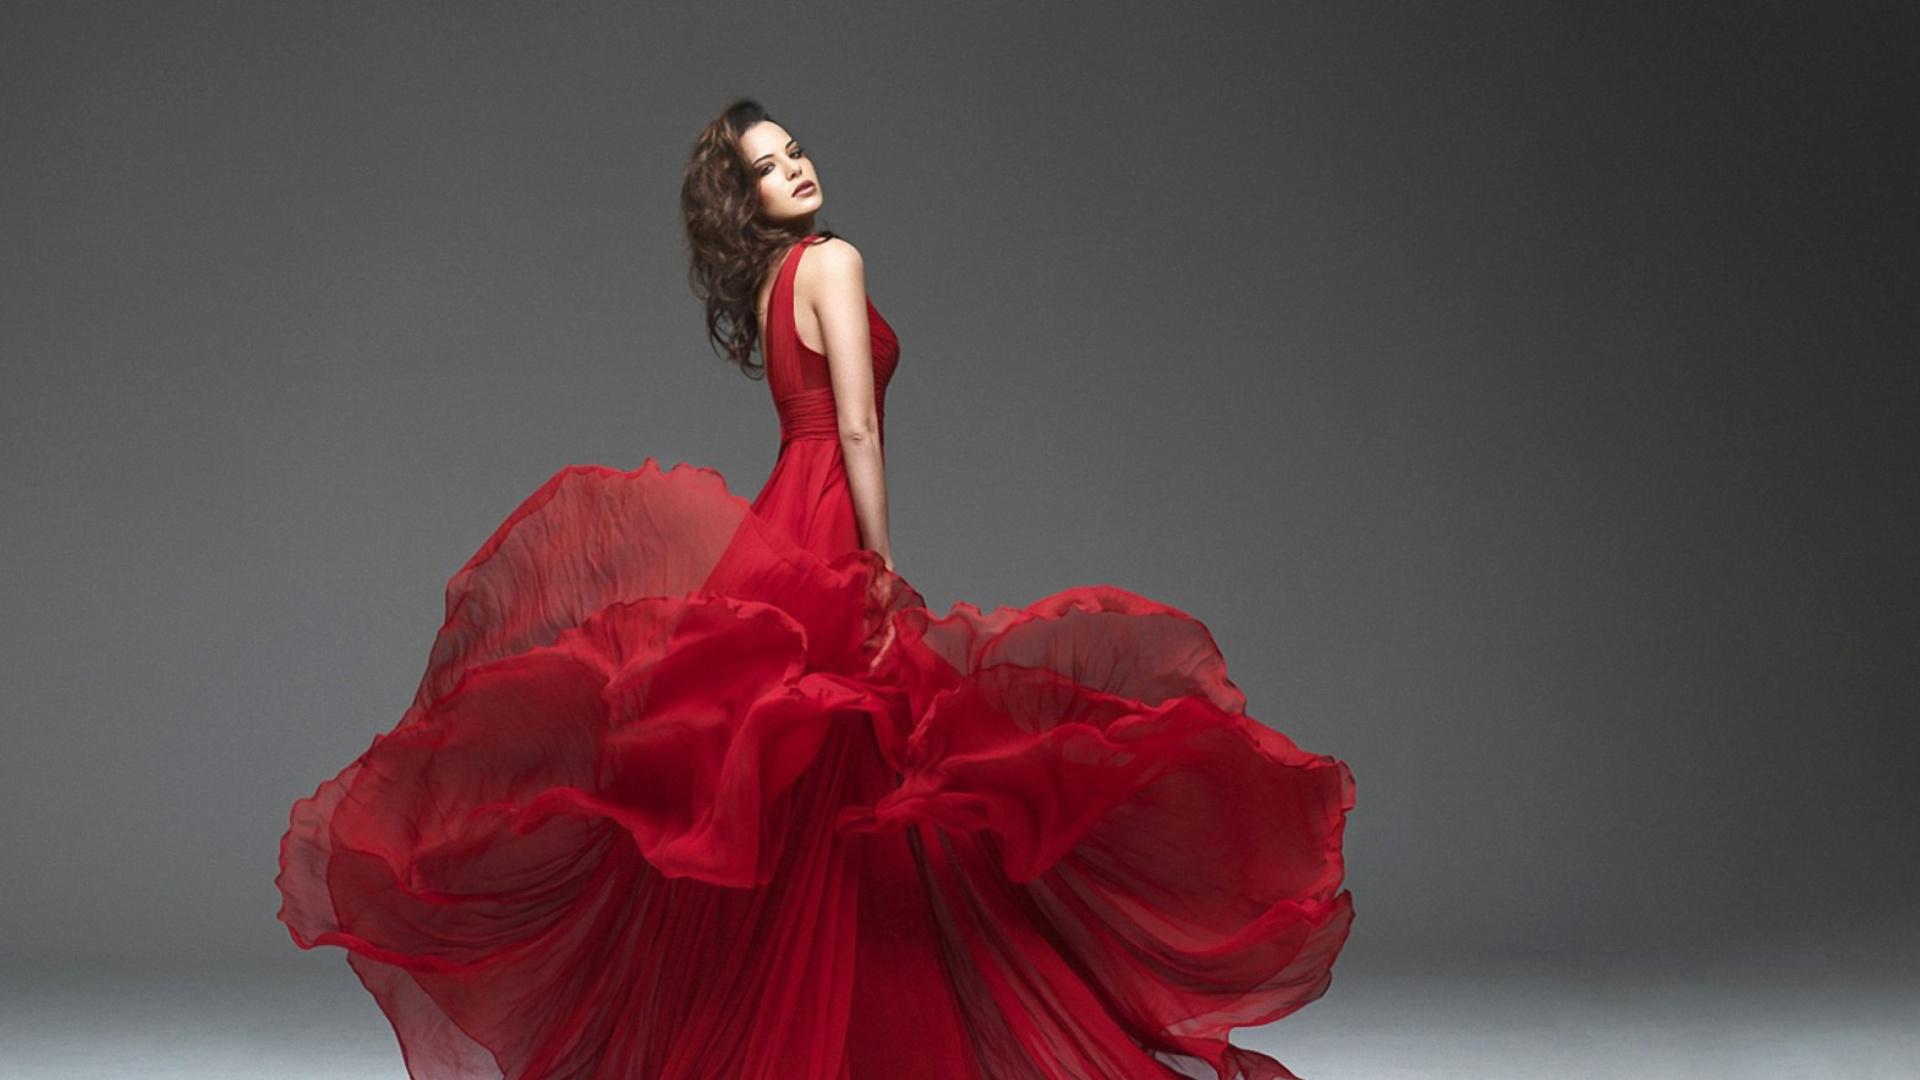 Girl in beautiful red dress wallpaper for desktop 1920x1080 full hd